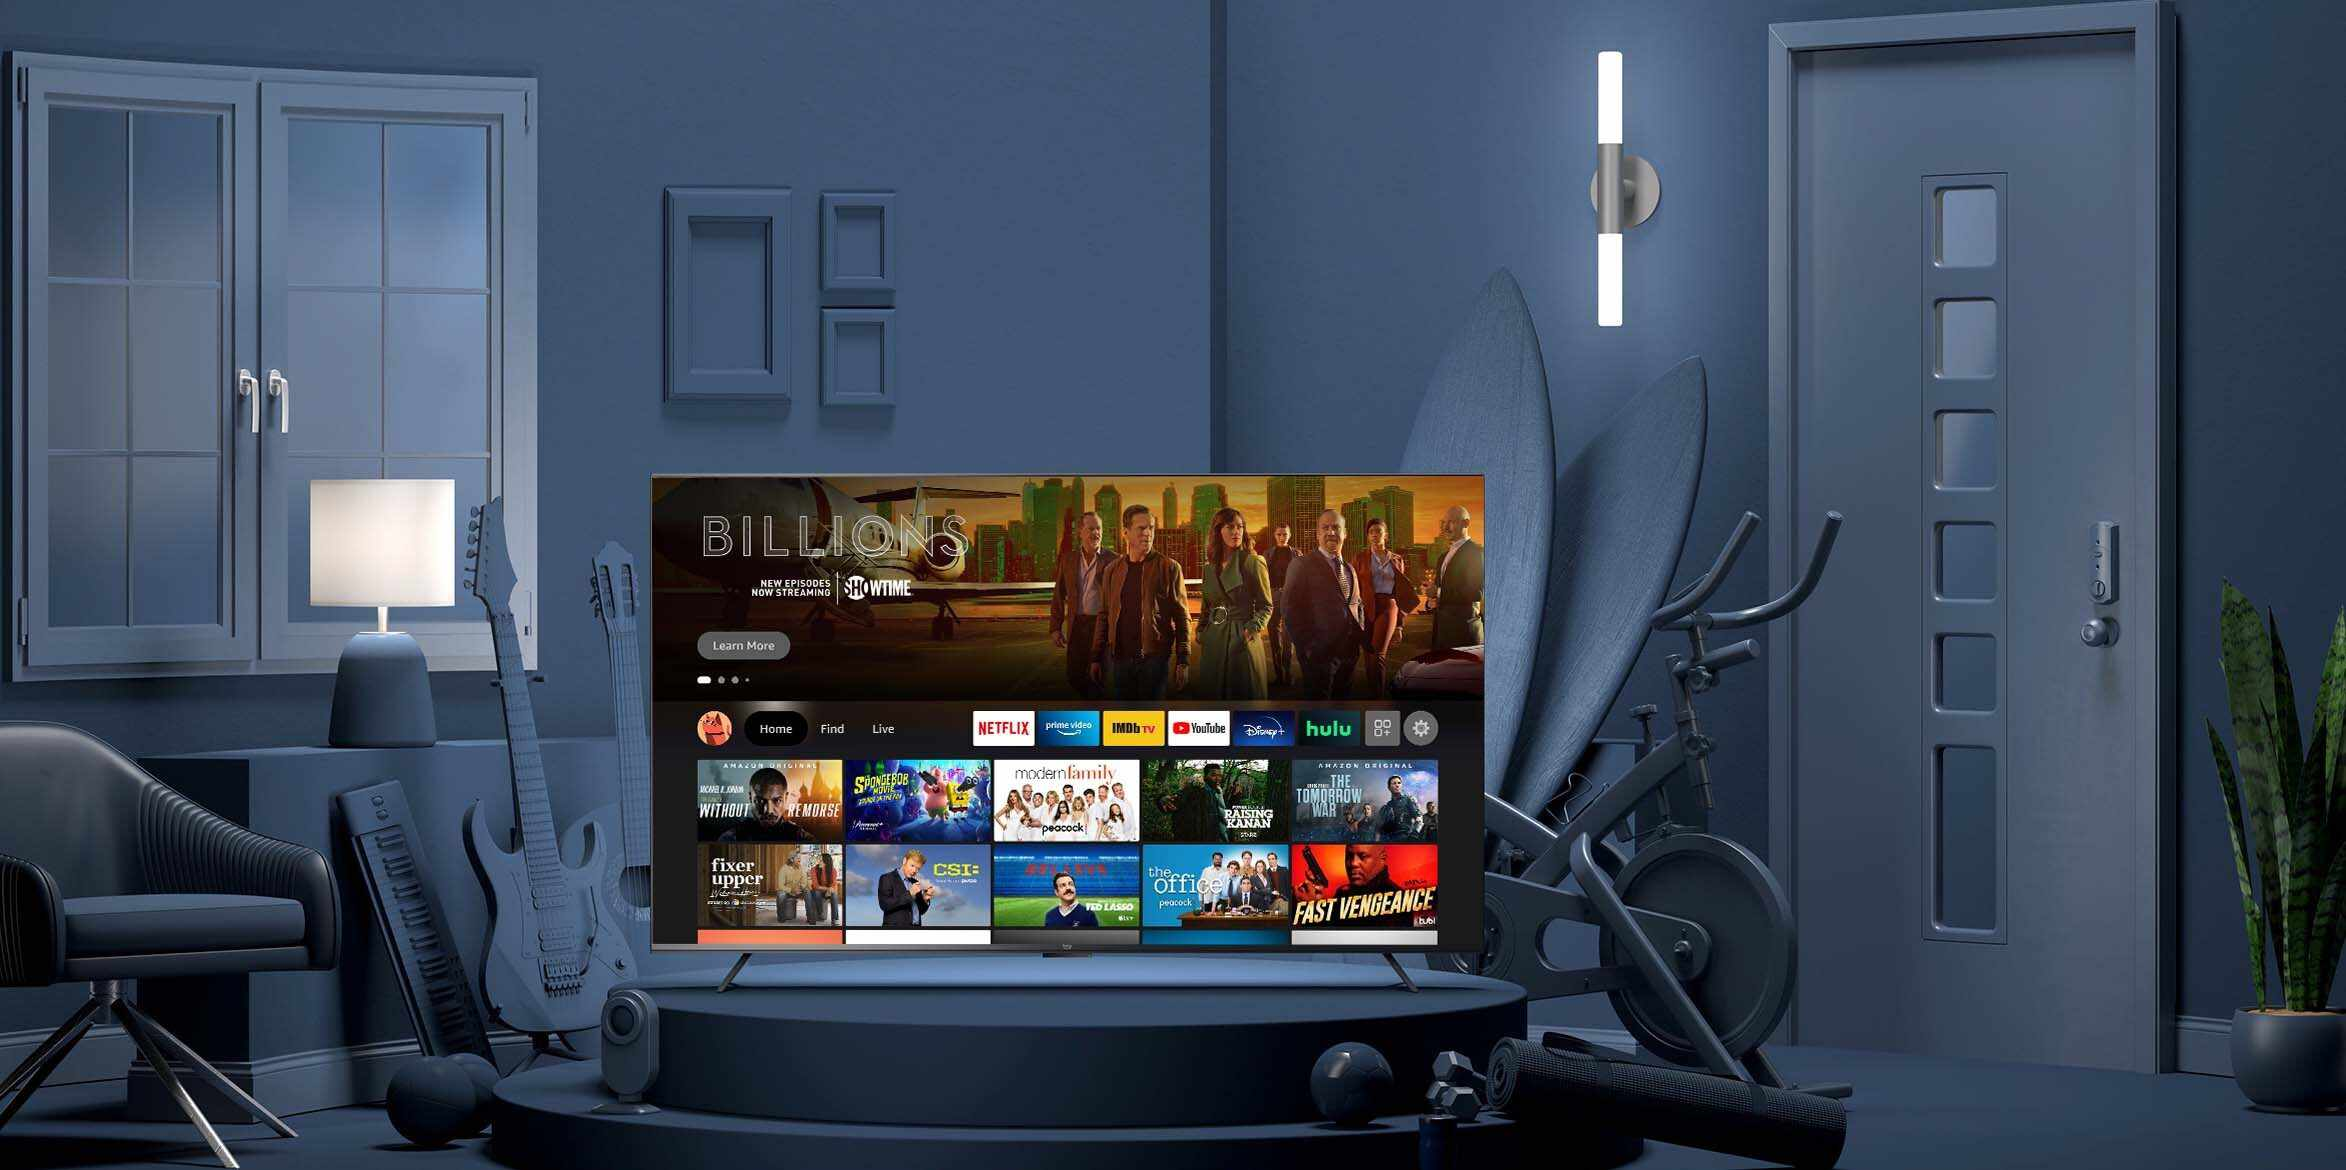 Amazon Omni series Smart TV in a living room